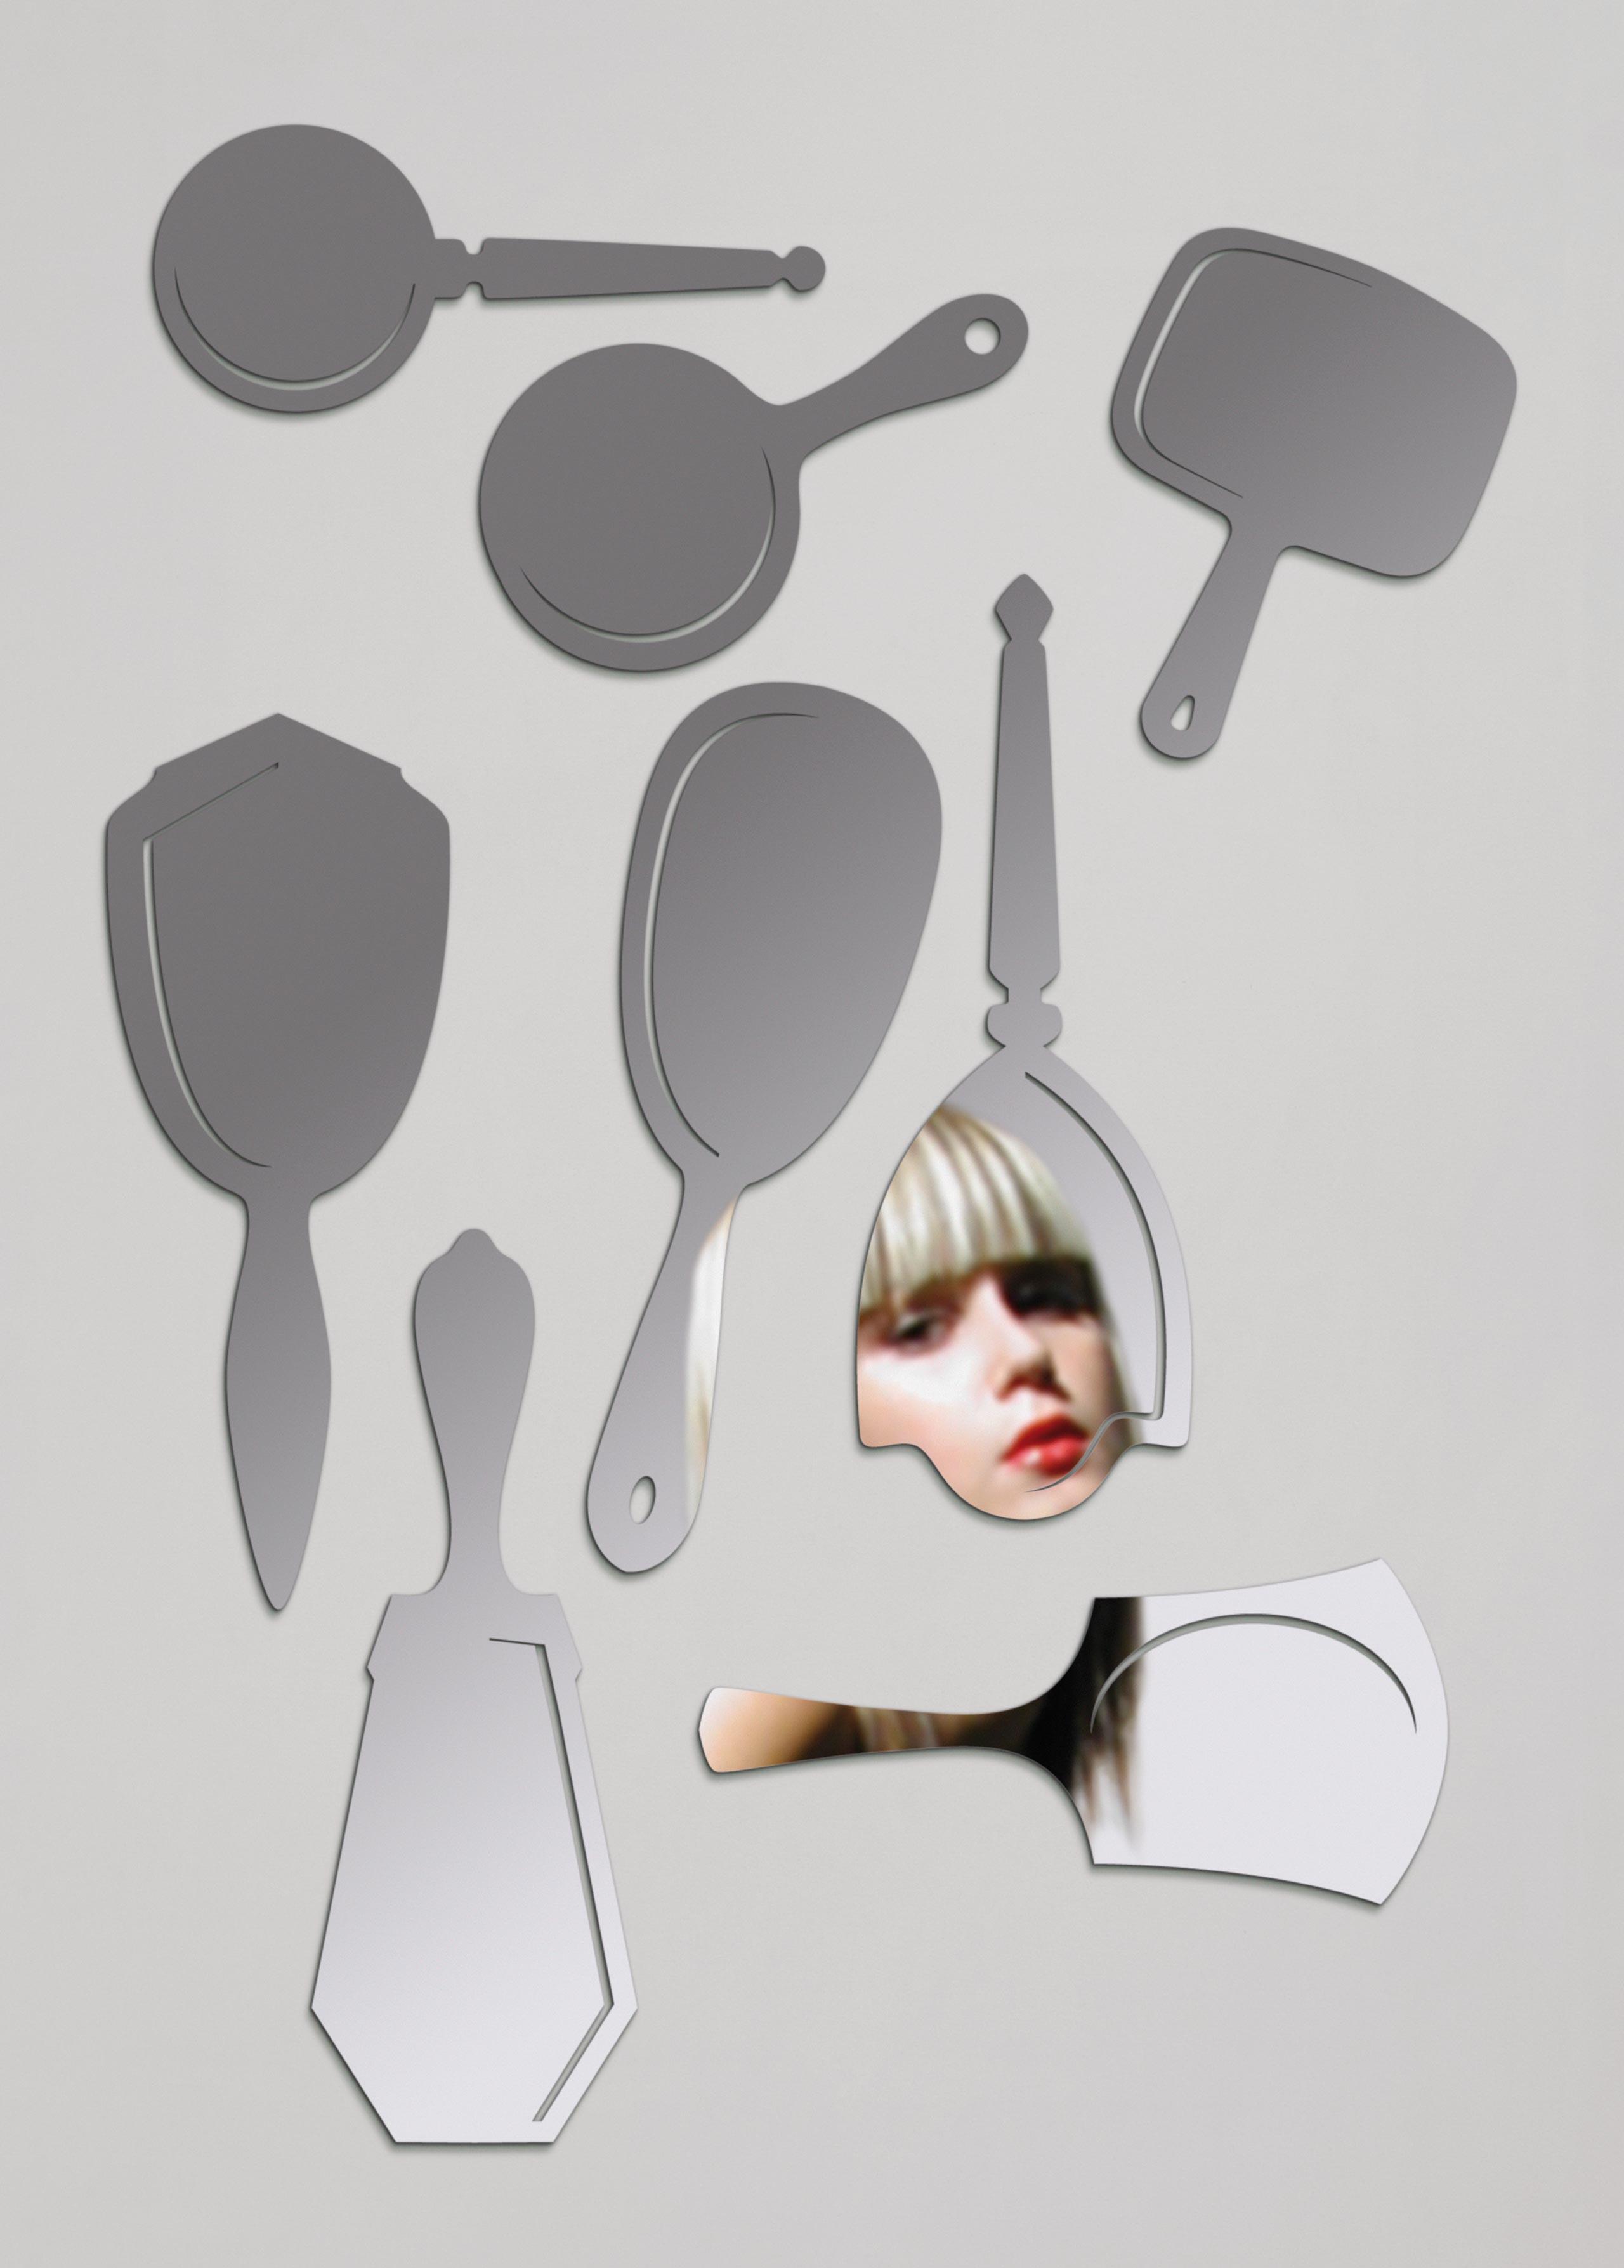 Miroirs - Ich&Kar - Miroir mon beau miroir - Domestic